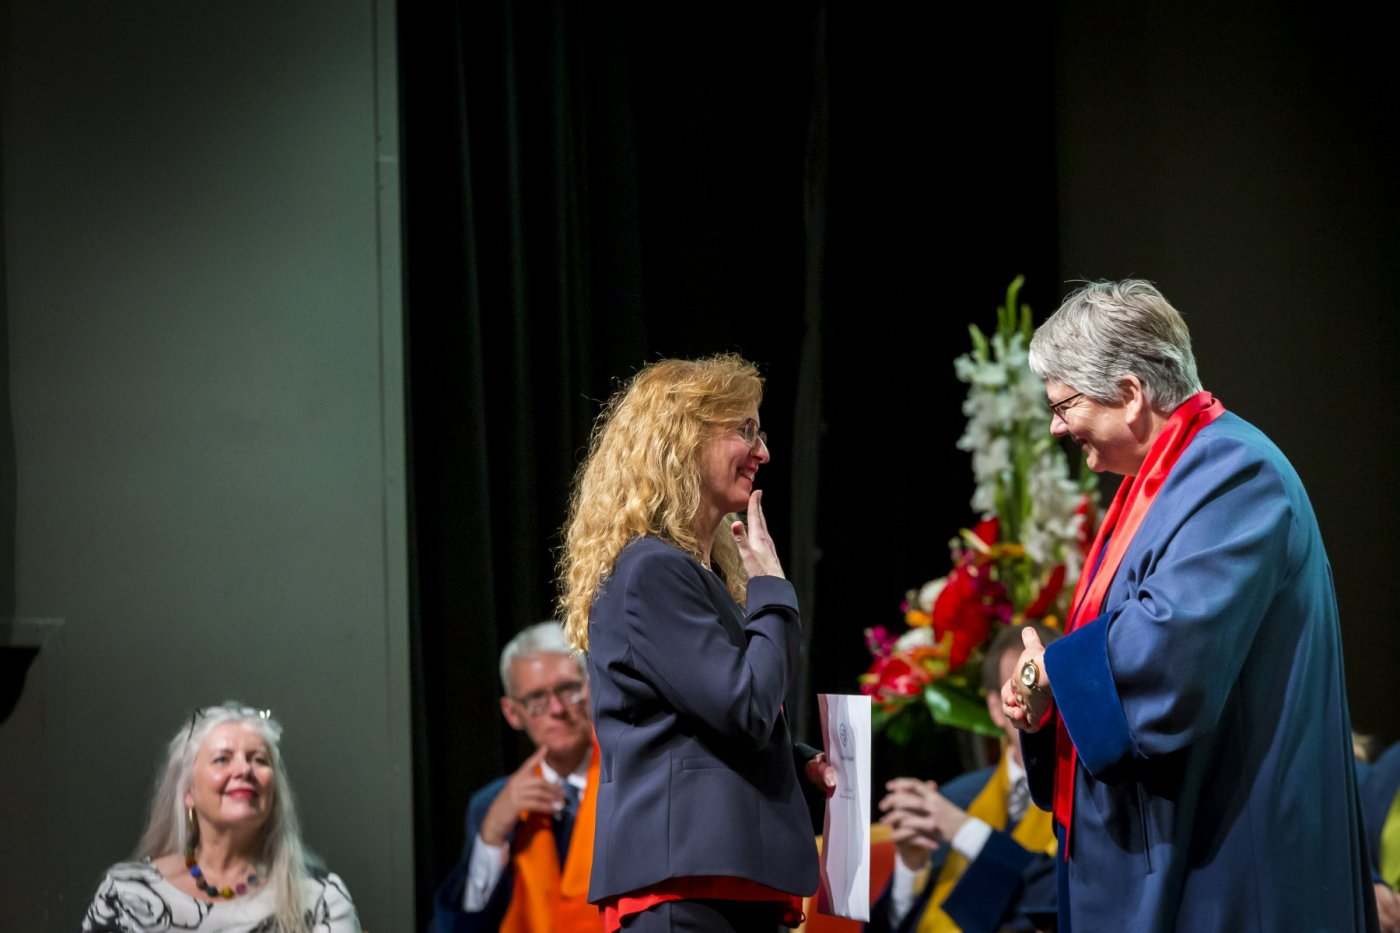 Eyrún Ólafsdóttir receiving her diploma from Jónína Vala Krististinsdóttir, Dean of the Faculty of Education and Pedagogy at the Graduation Ceremony 22 June 2019. photo/Kristinn Ingvarsson